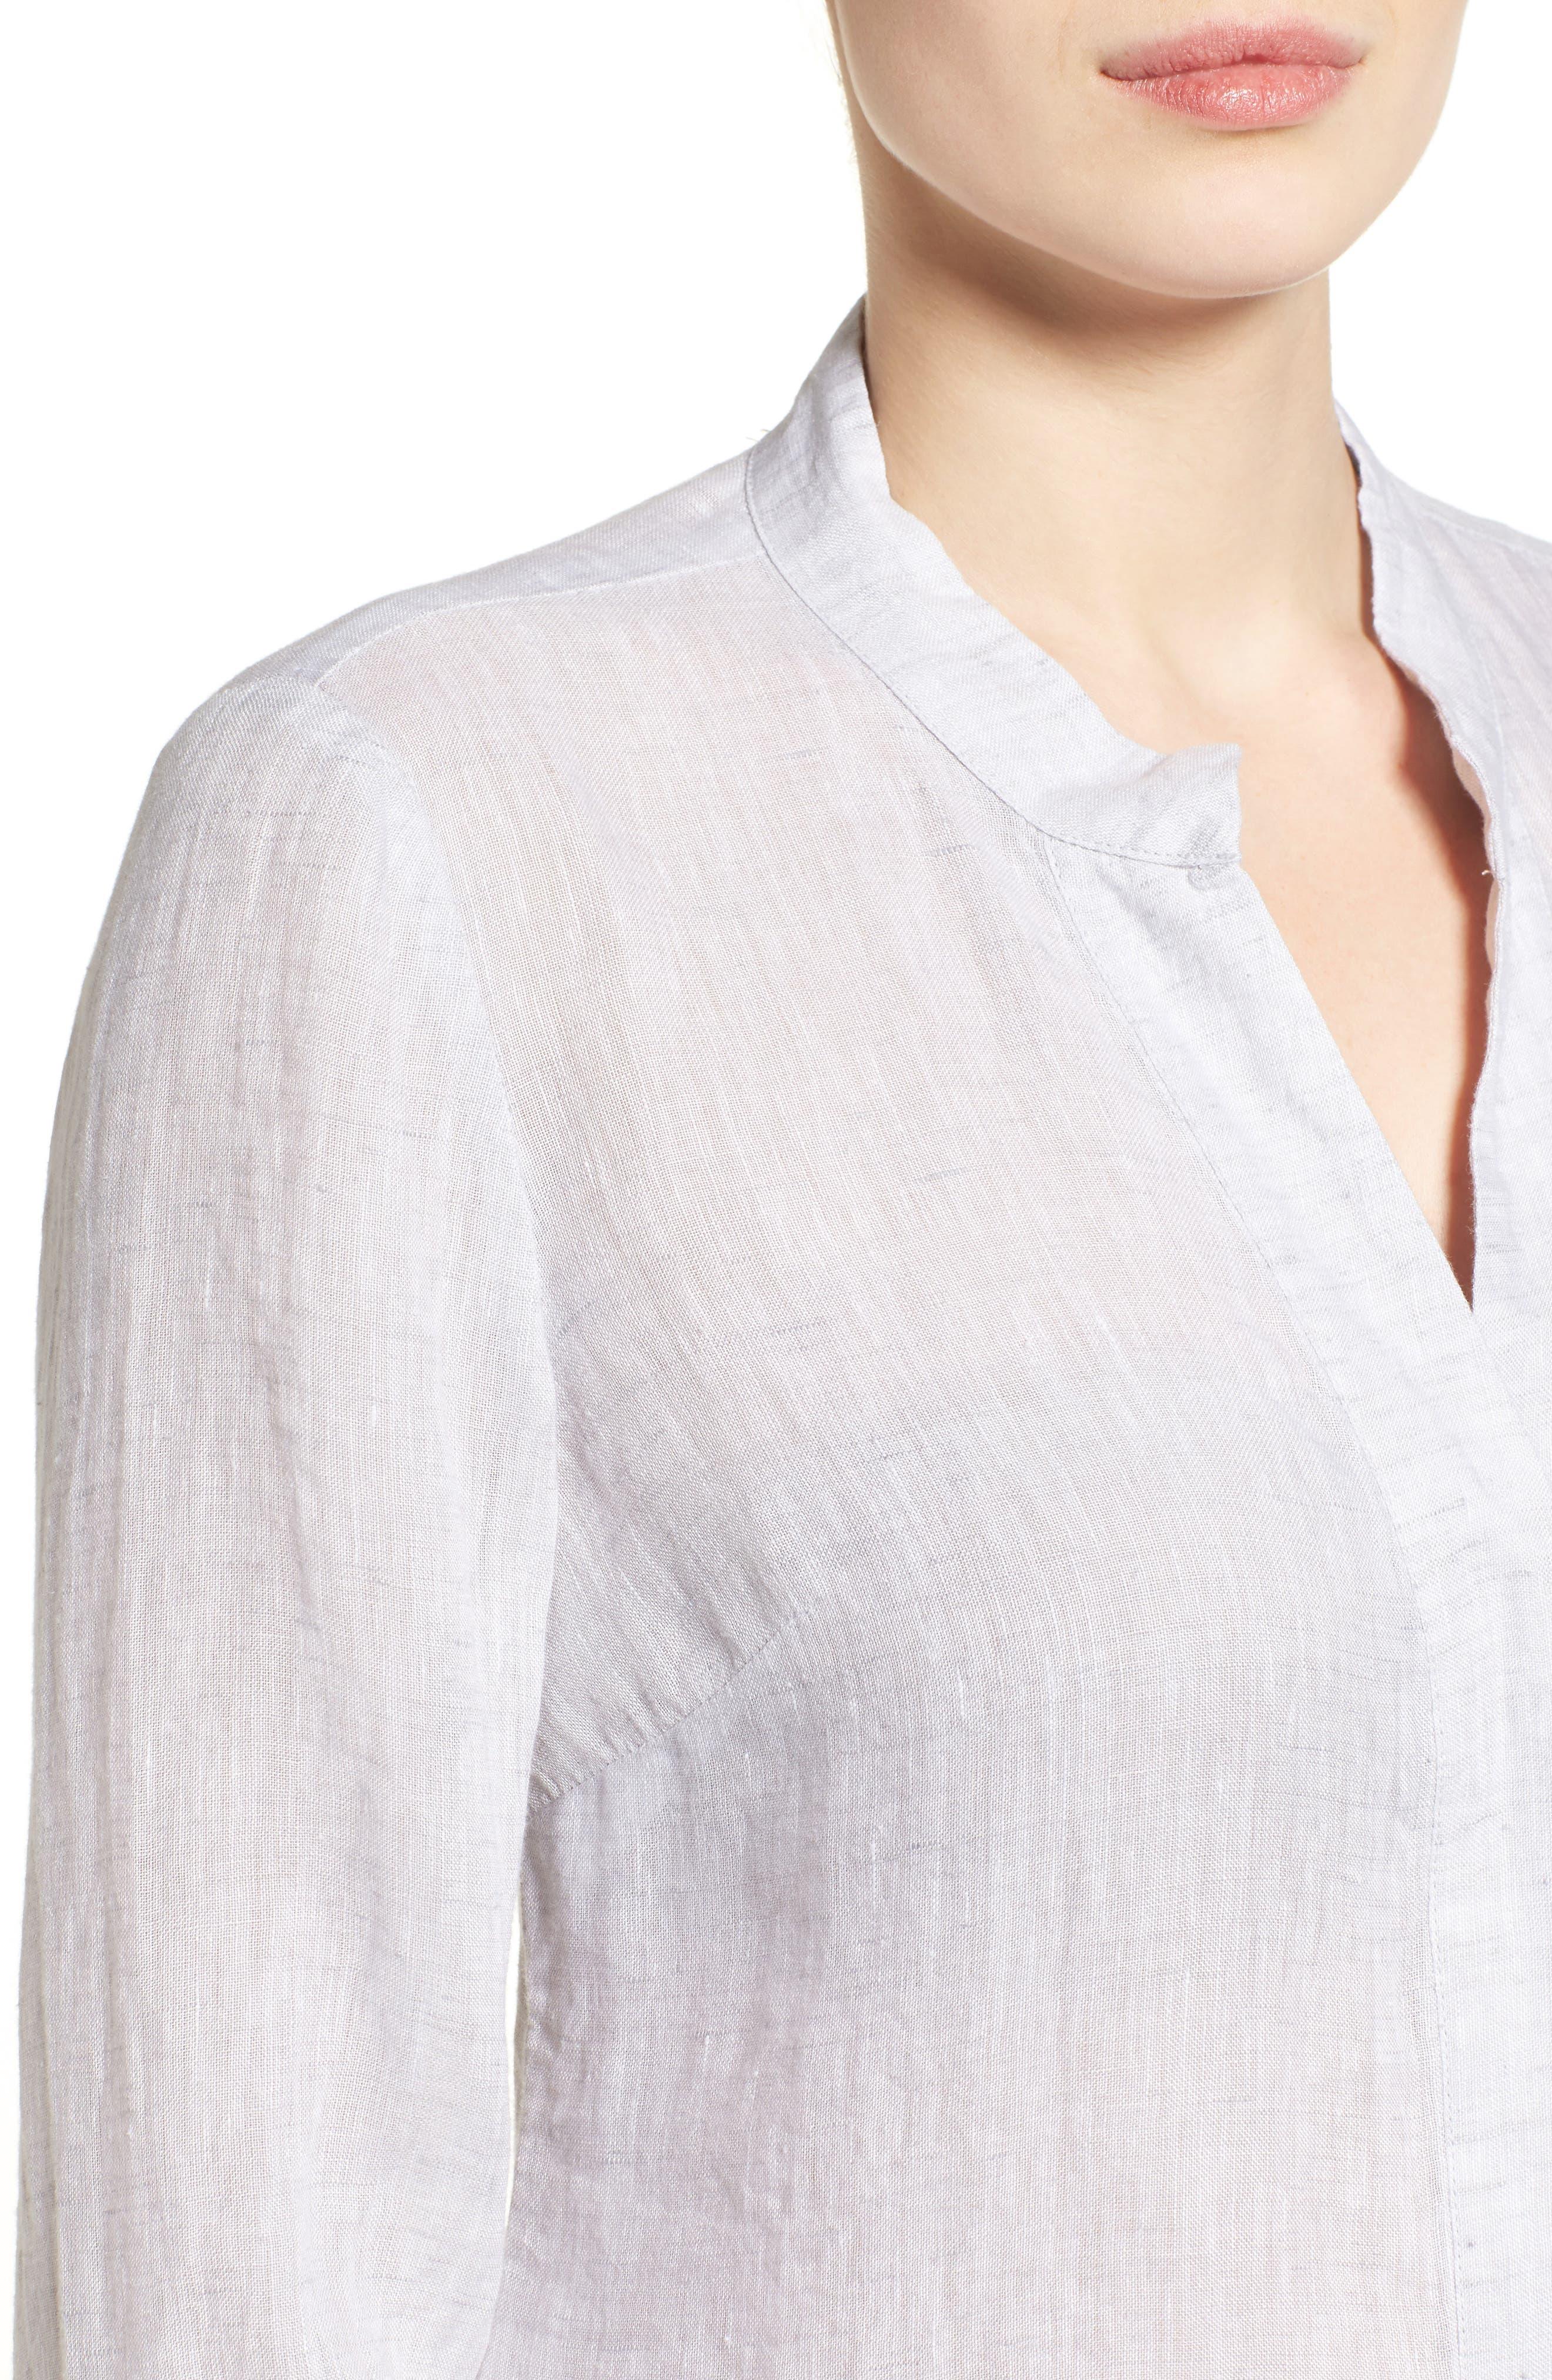 Drifty Linen Shirt,                             Alternate thumbnail 4, color,                             030